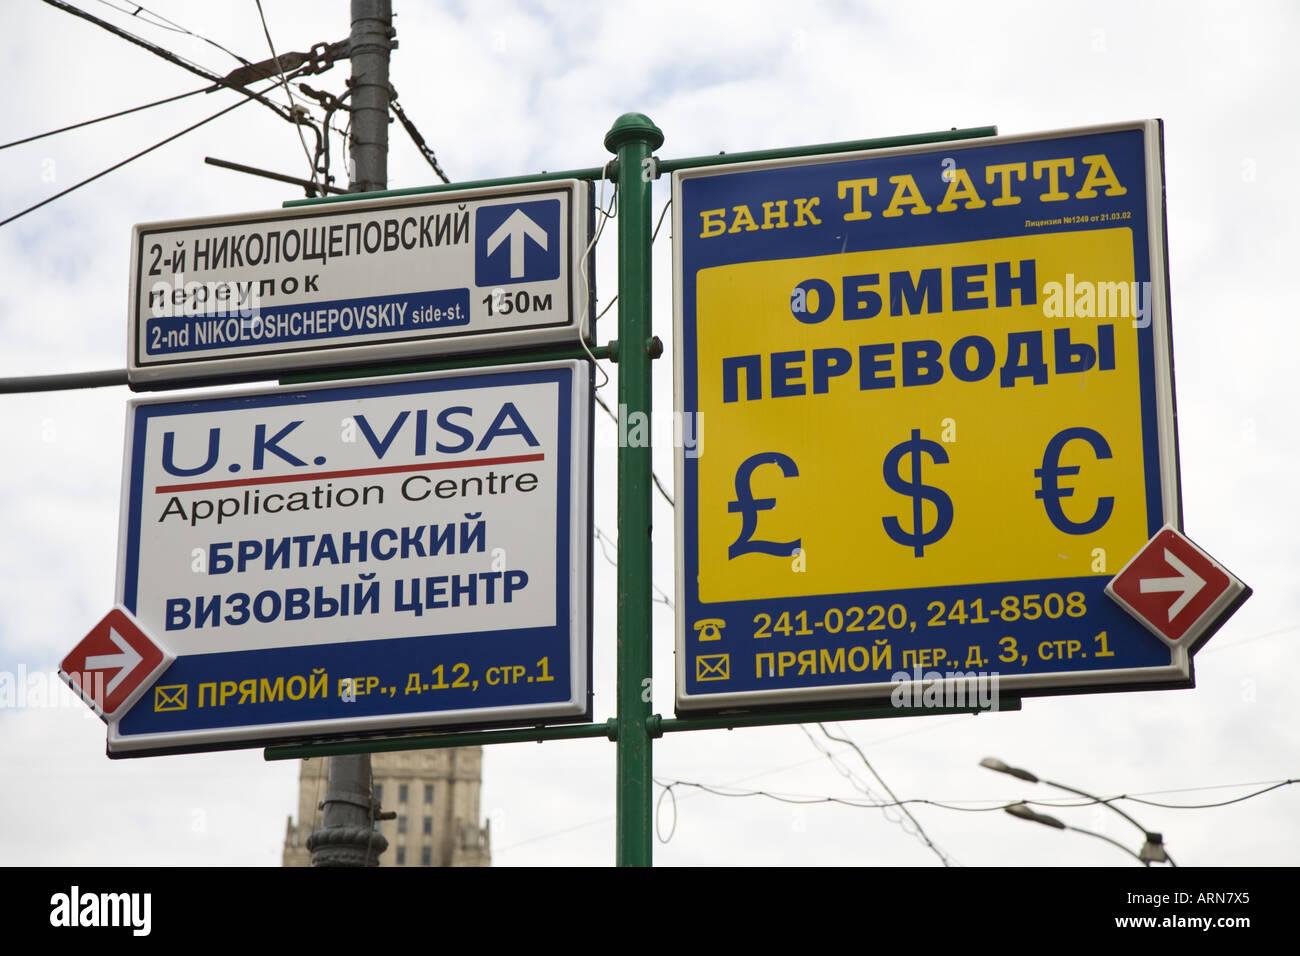 Visa forex exchange